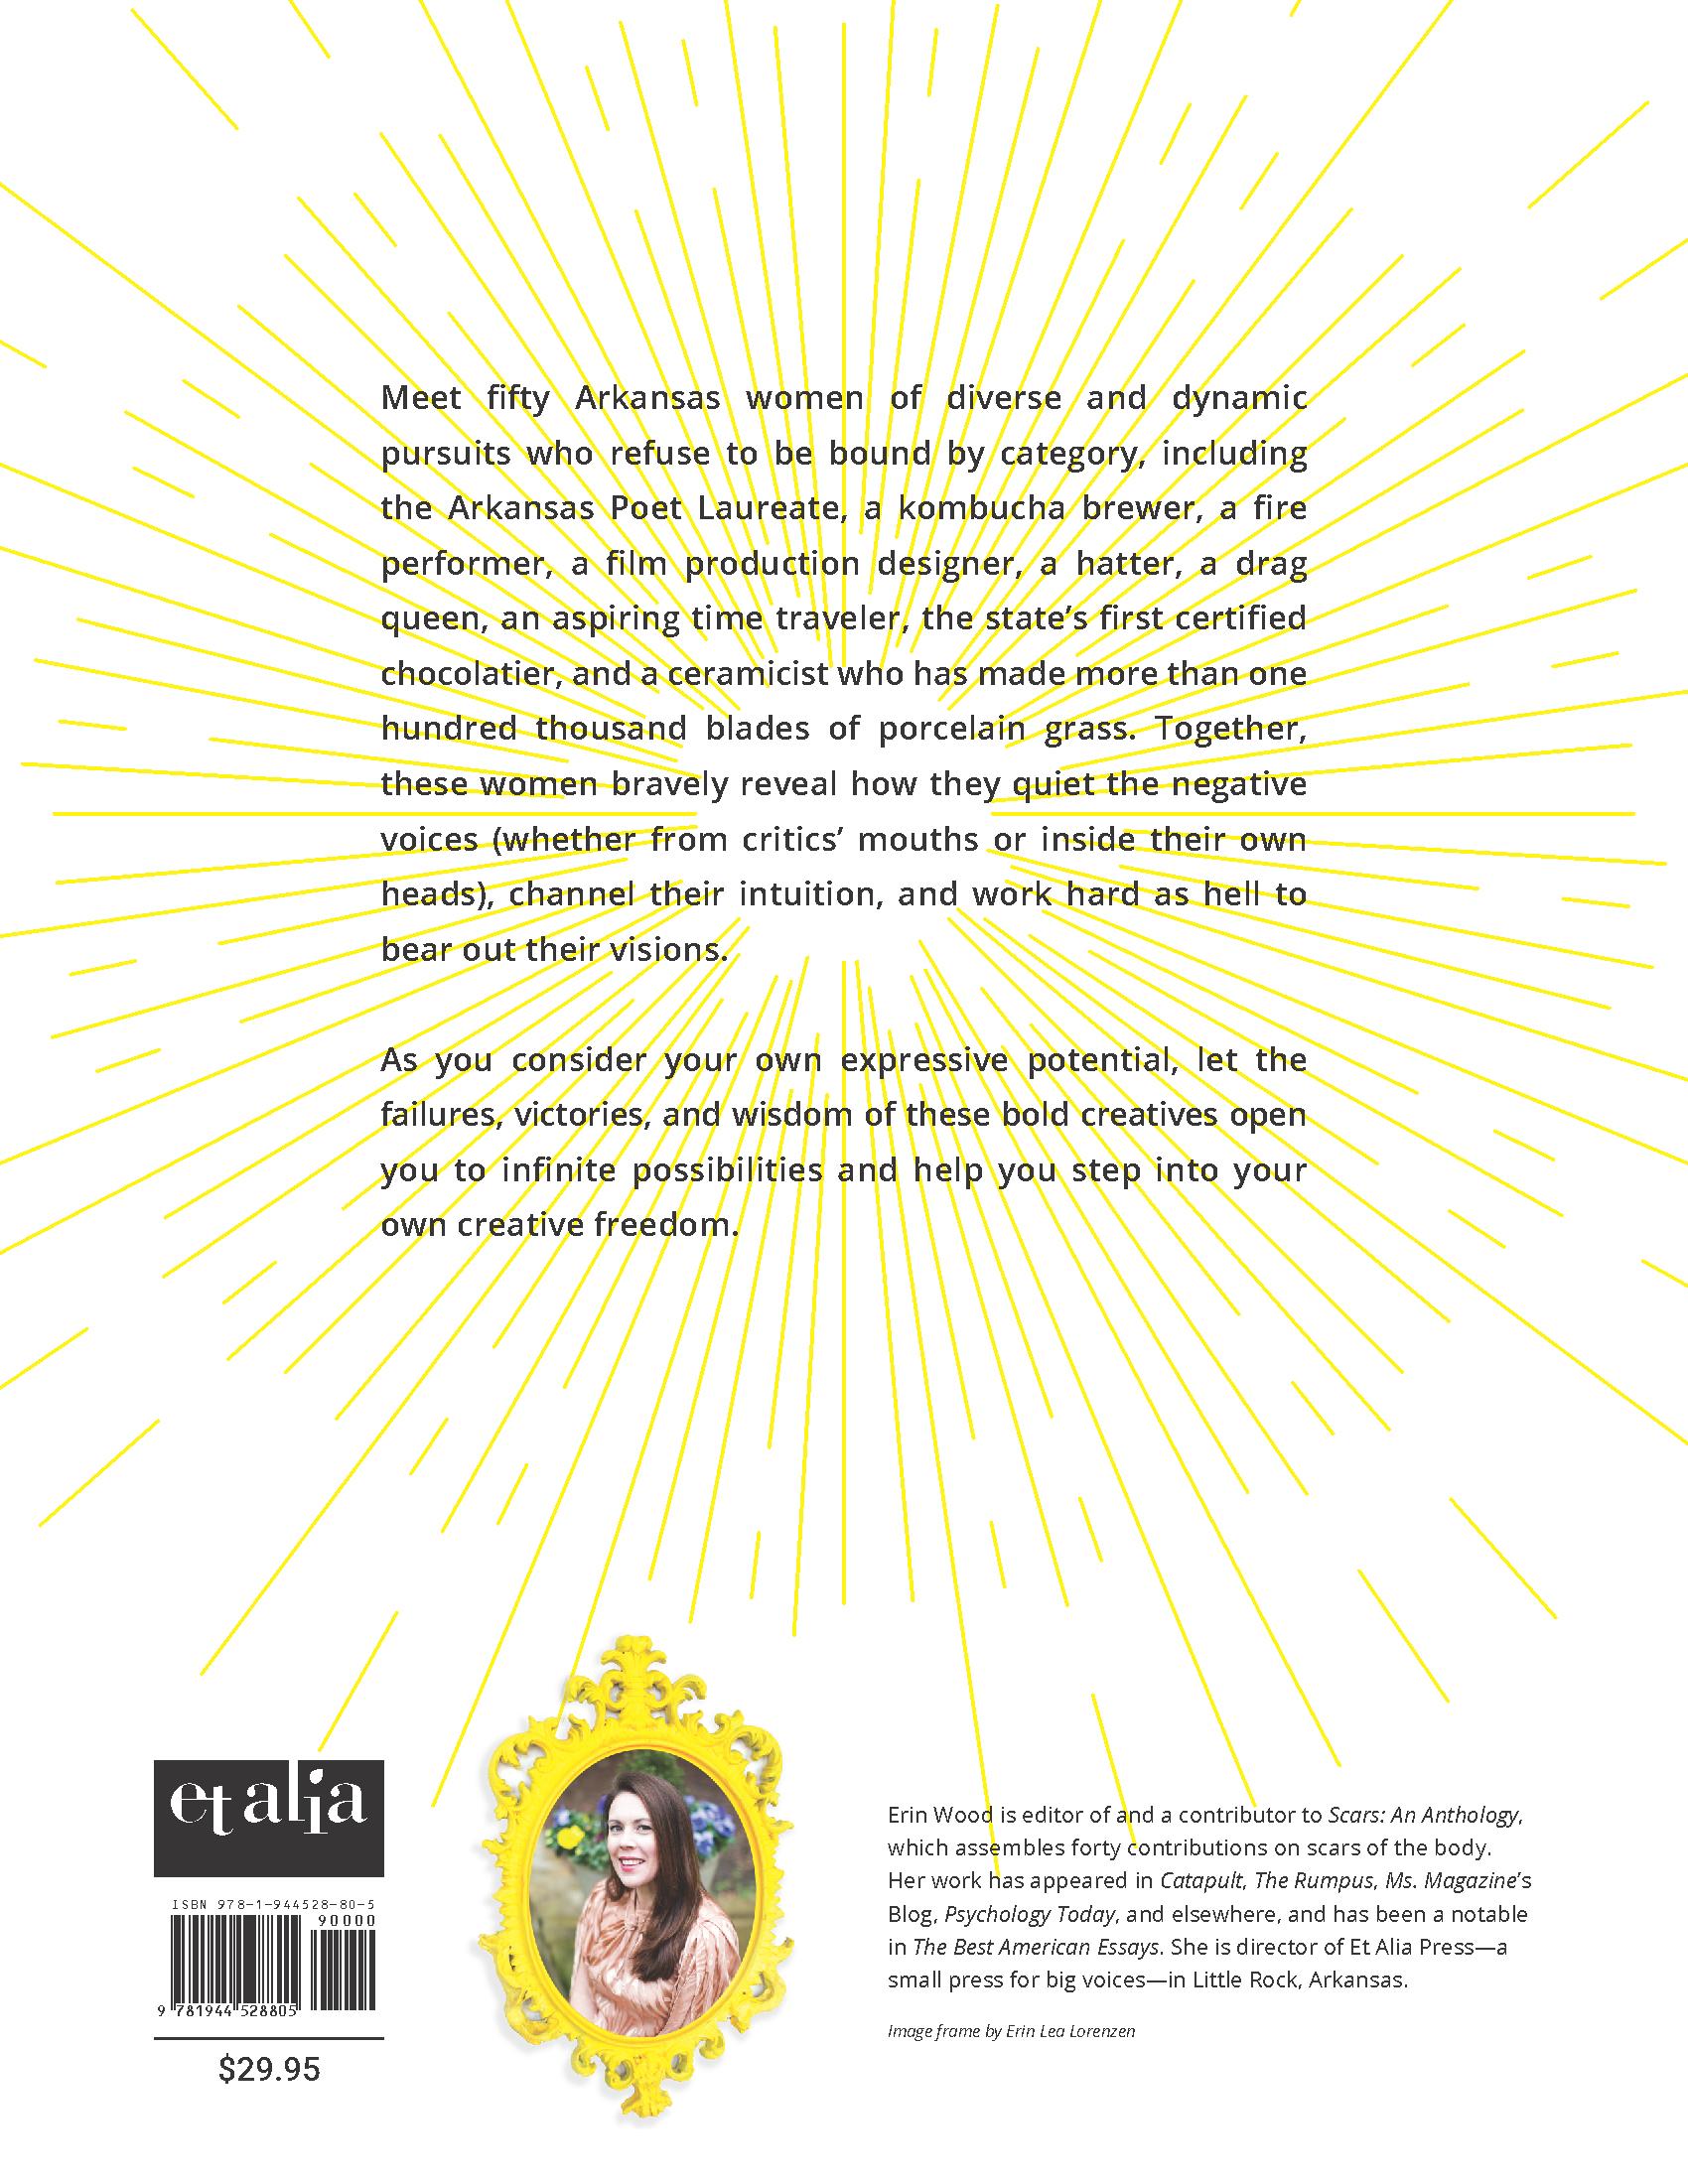 Women Make Arkansas: Conversations with 50 Creatives — Et Alia Press